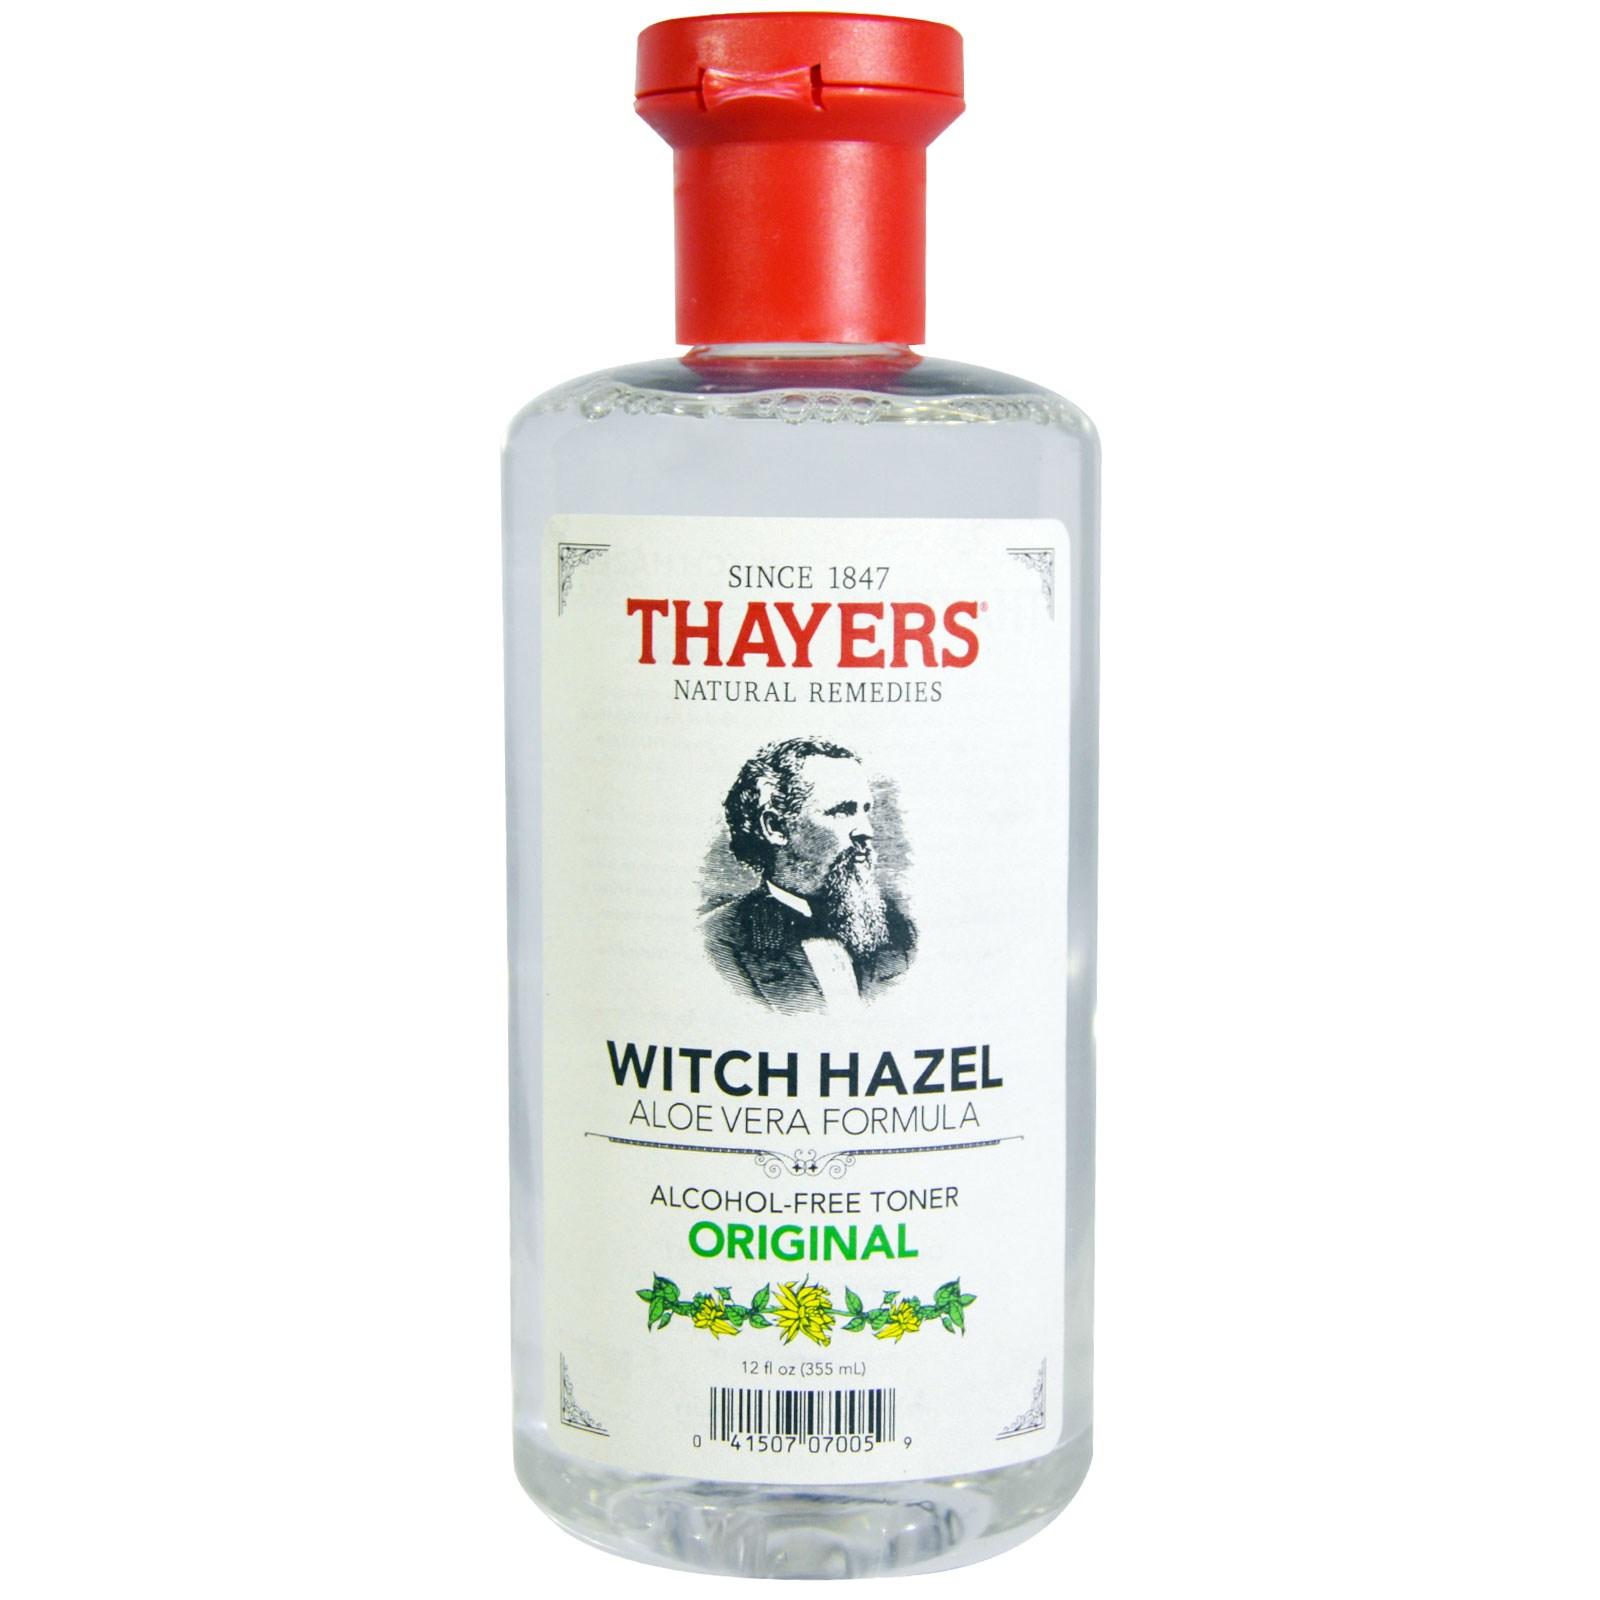 Thayers Witch Hazel with Aloe Vera, Original Astringent 12 oz (Pack of 2) origins ritualitea matcha powder face mask